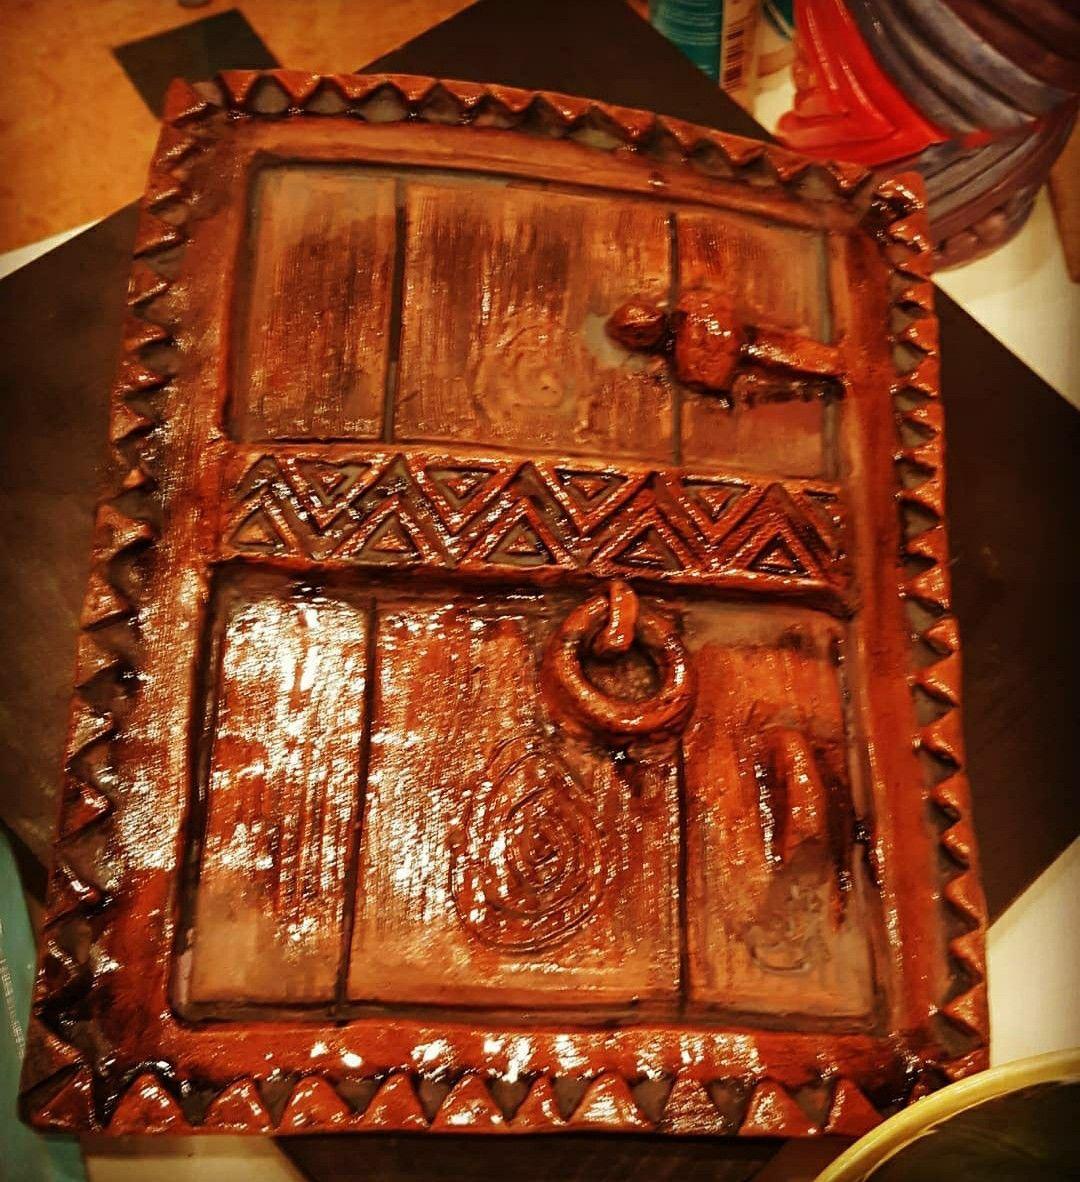 Ceramic خزف Decorative Boxes Decor Home Decor